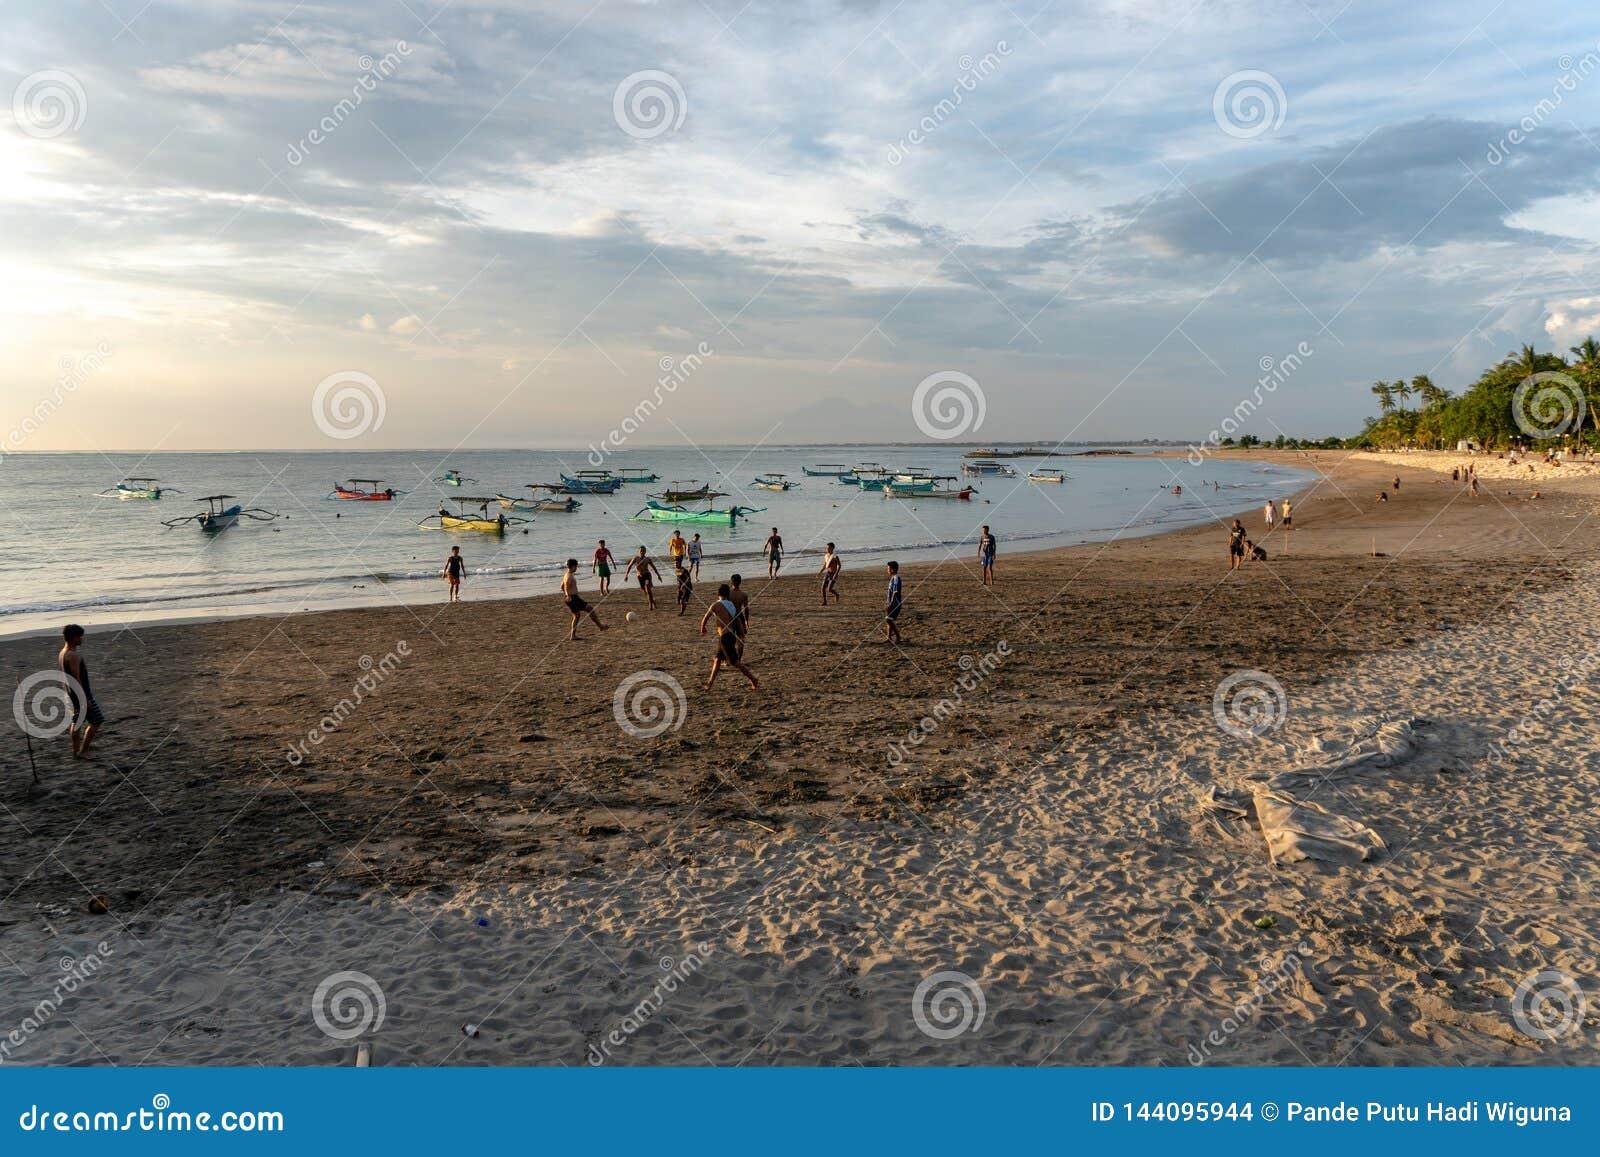 BADUNG, BALI/INDONESIA- 2 ΑΠΡΙΛΊΟΥ 2019: Ασιατικό ποδόσφαιρο ή ποδόσφαιρο παιχνιδιού εφήβων στην παραλία με το ηλιοβασίλεμα ή το